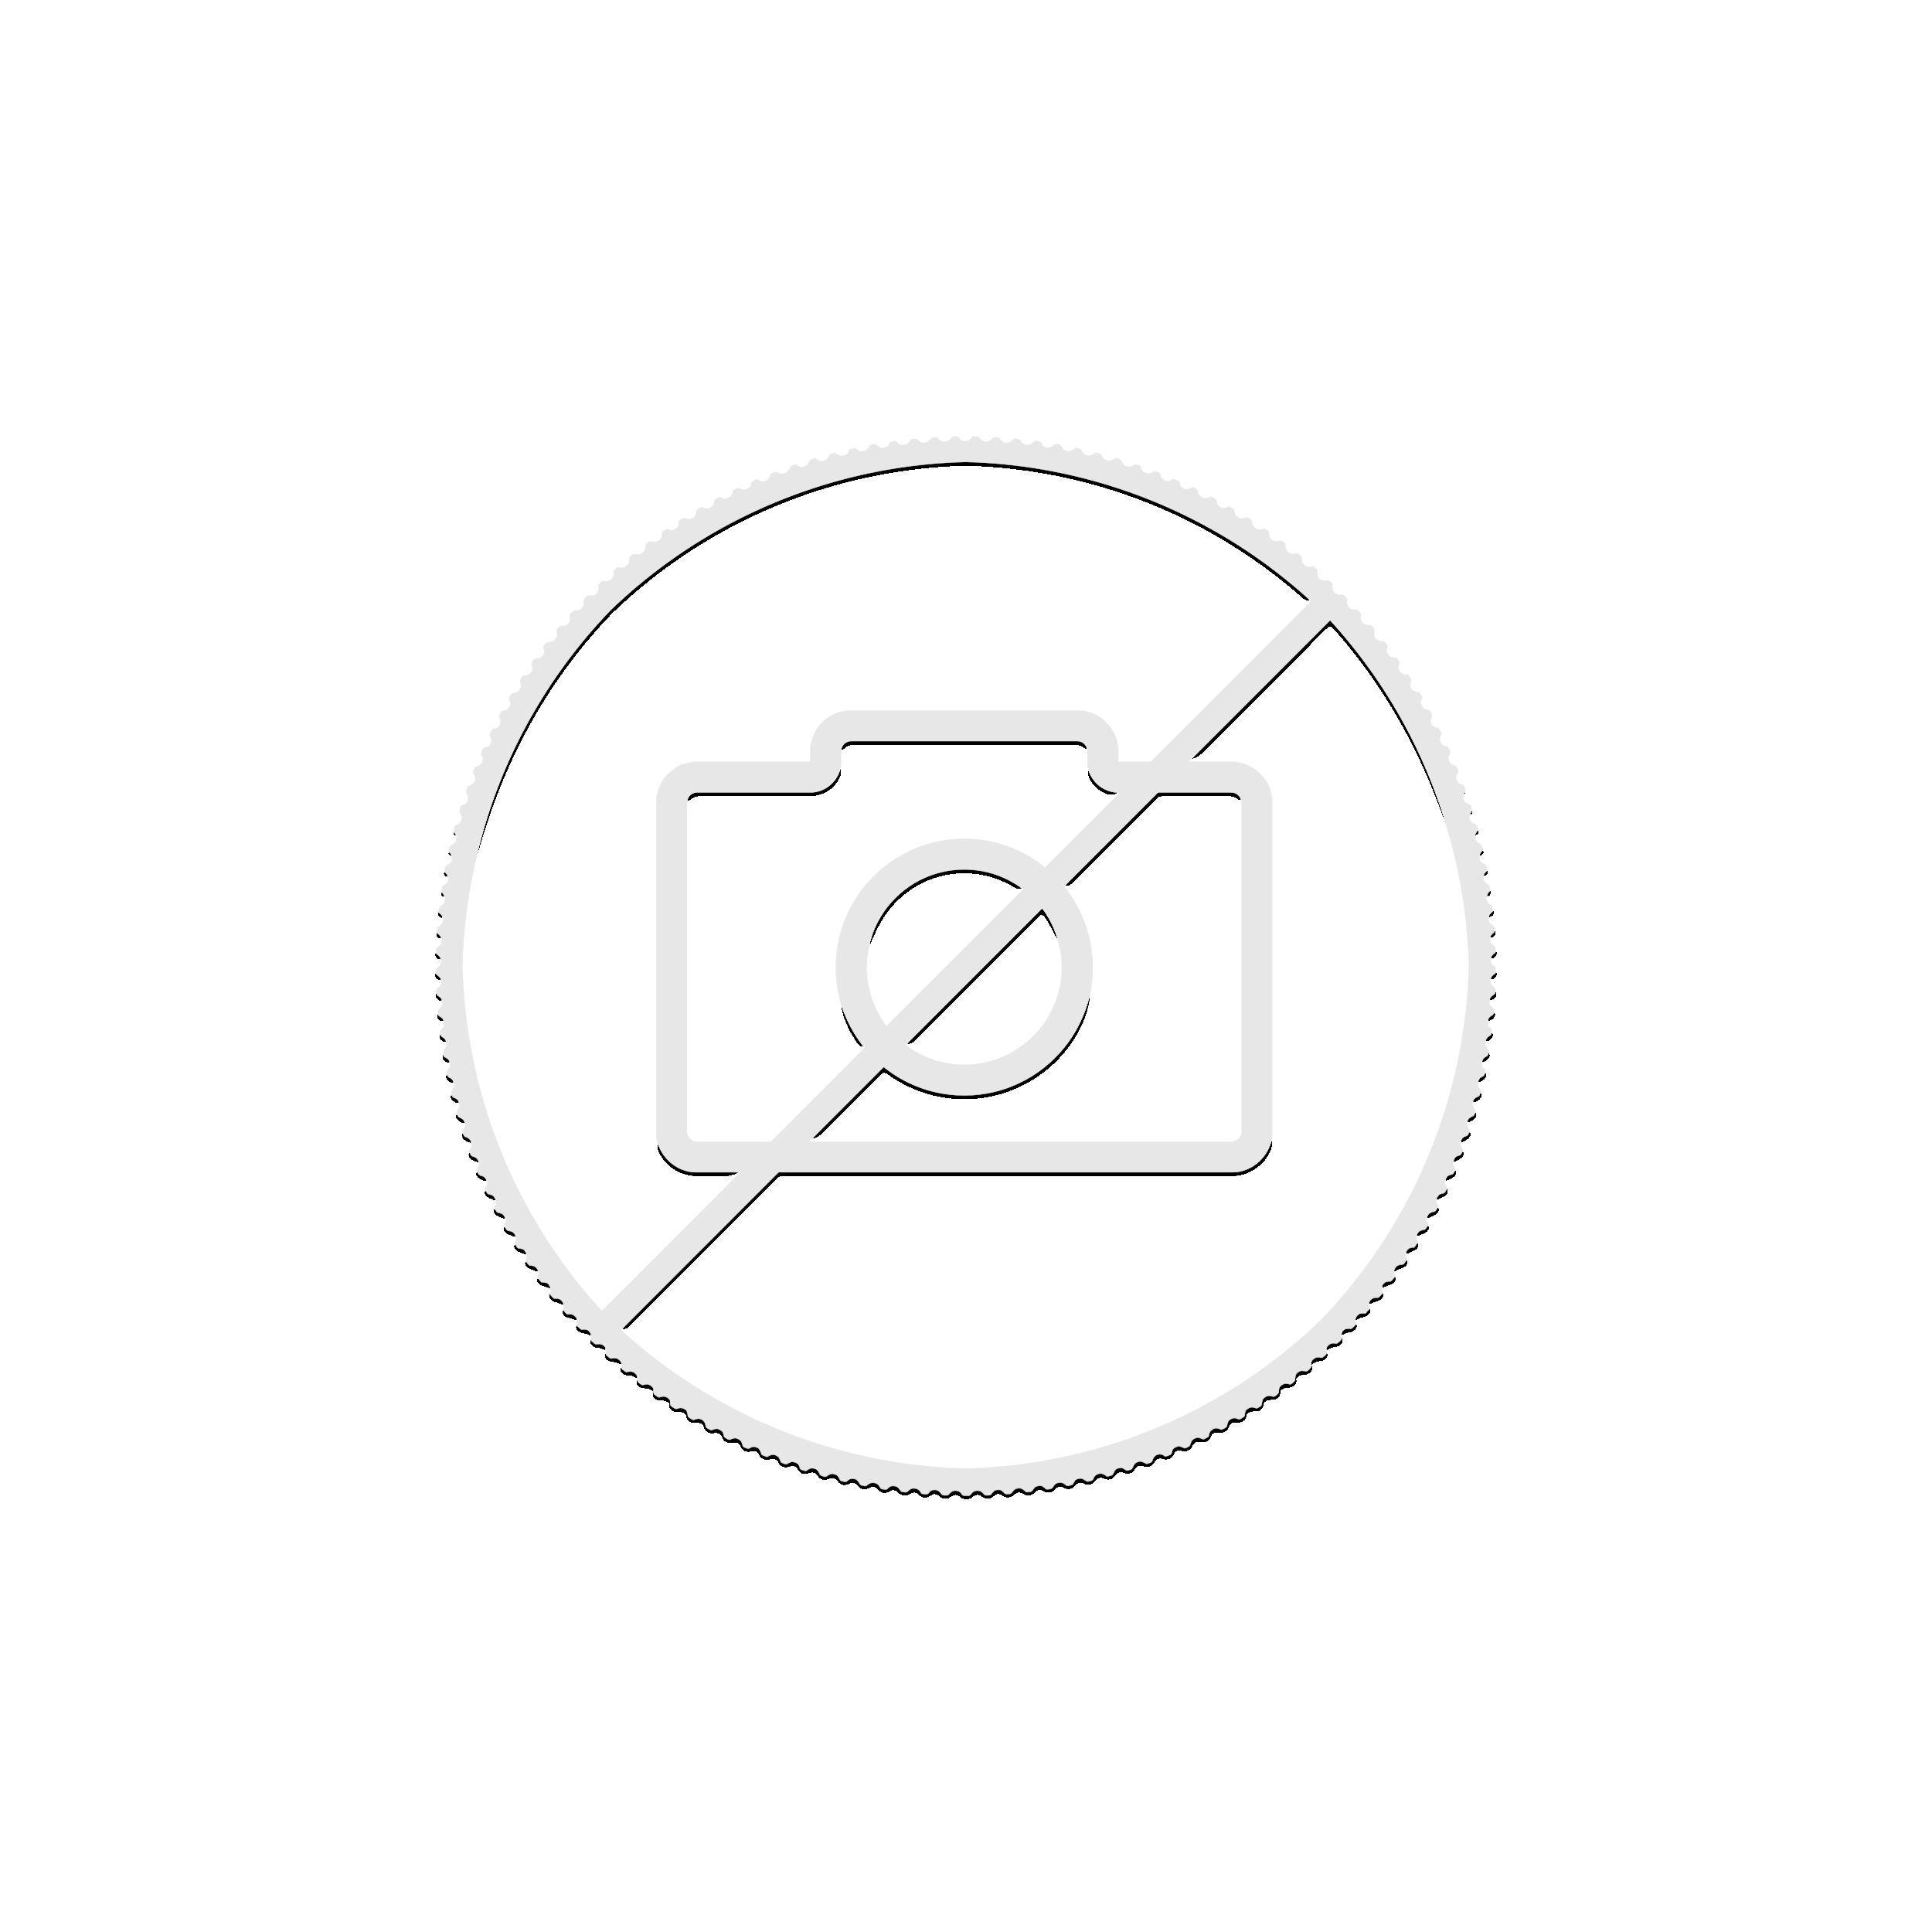 5-Delige set gouden munten Panda 2019